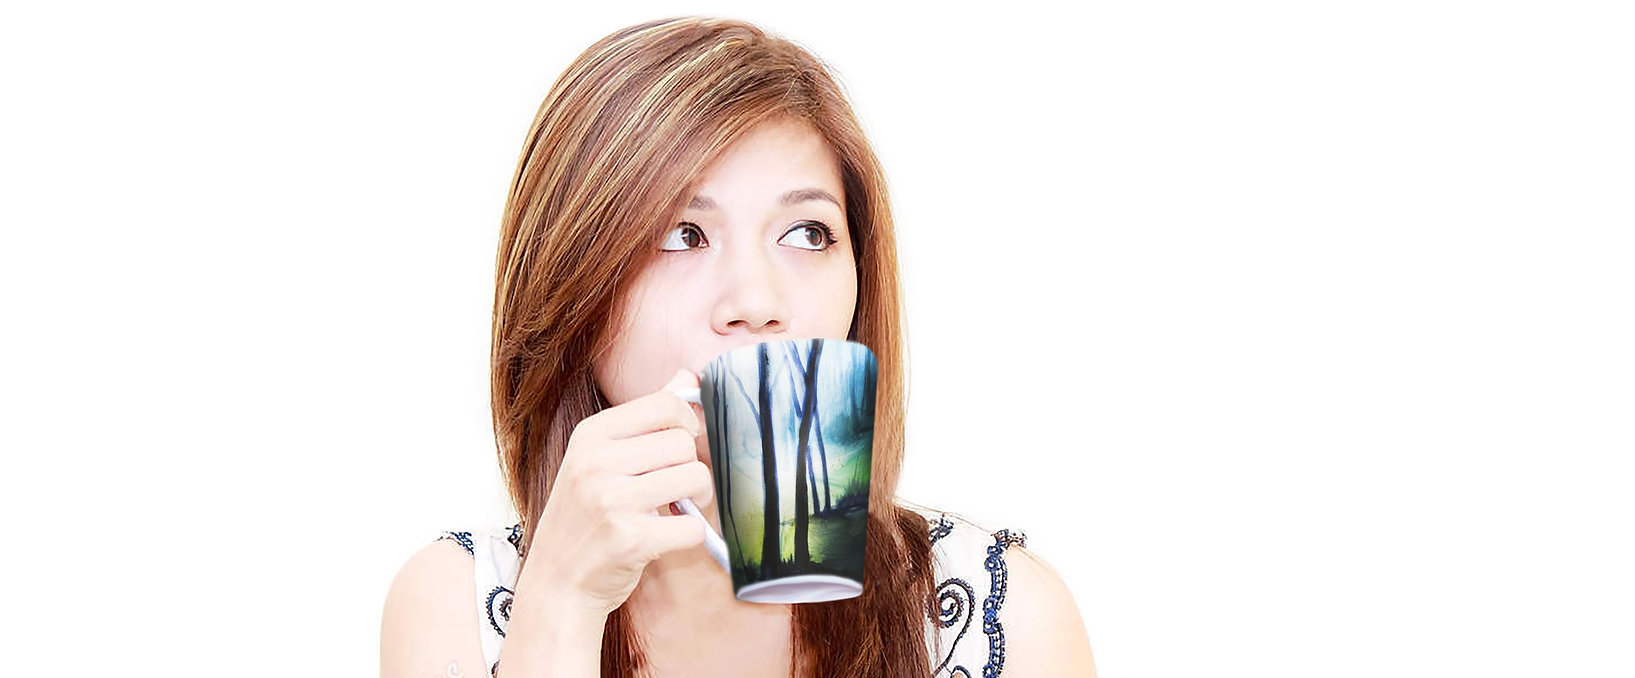 Asian Woman Latte Sample Art.jpg